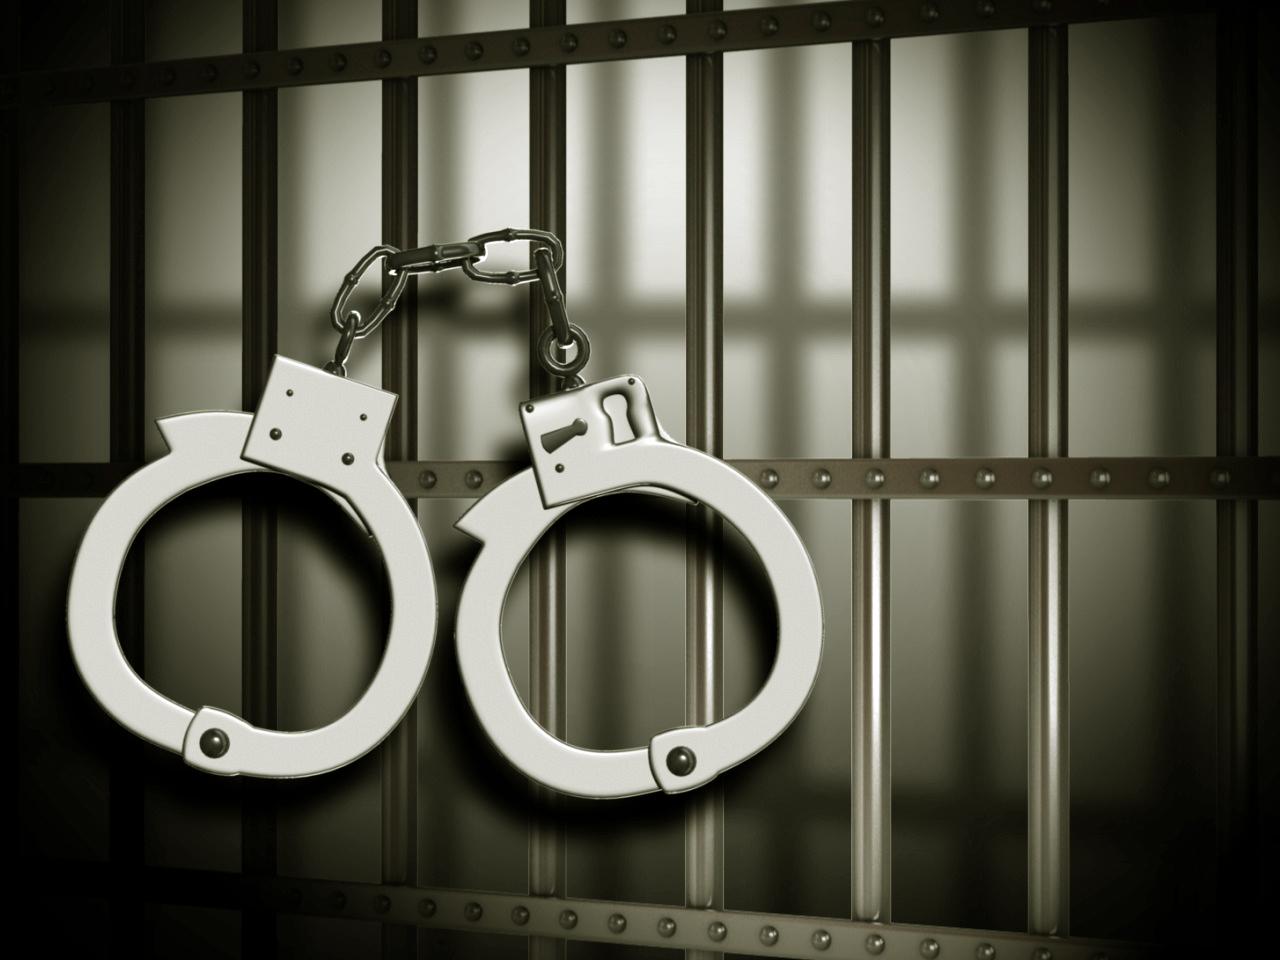 Three women arrested